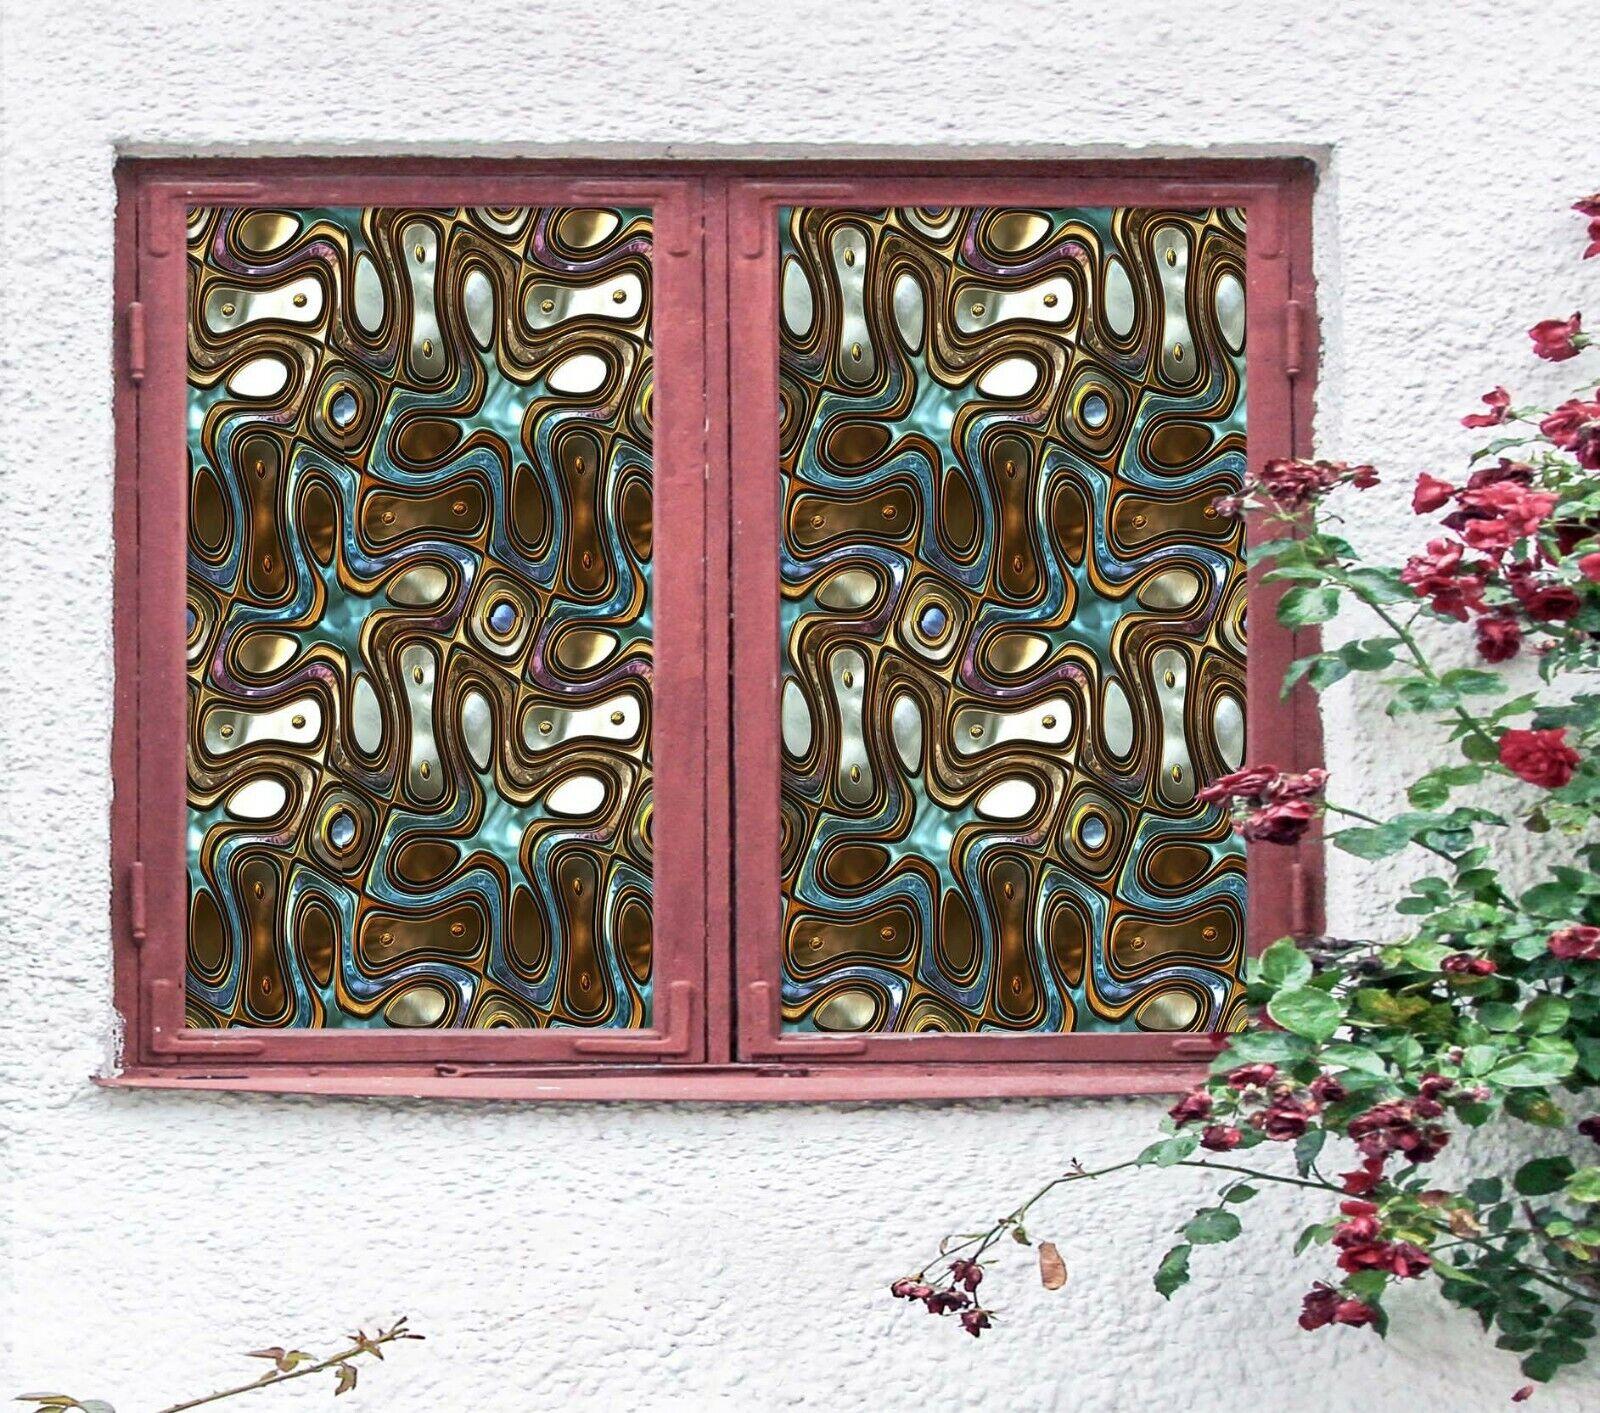 3D Metal Pattern N798 Window Film Print Sticker Cling Stained Glass UV Block Amy